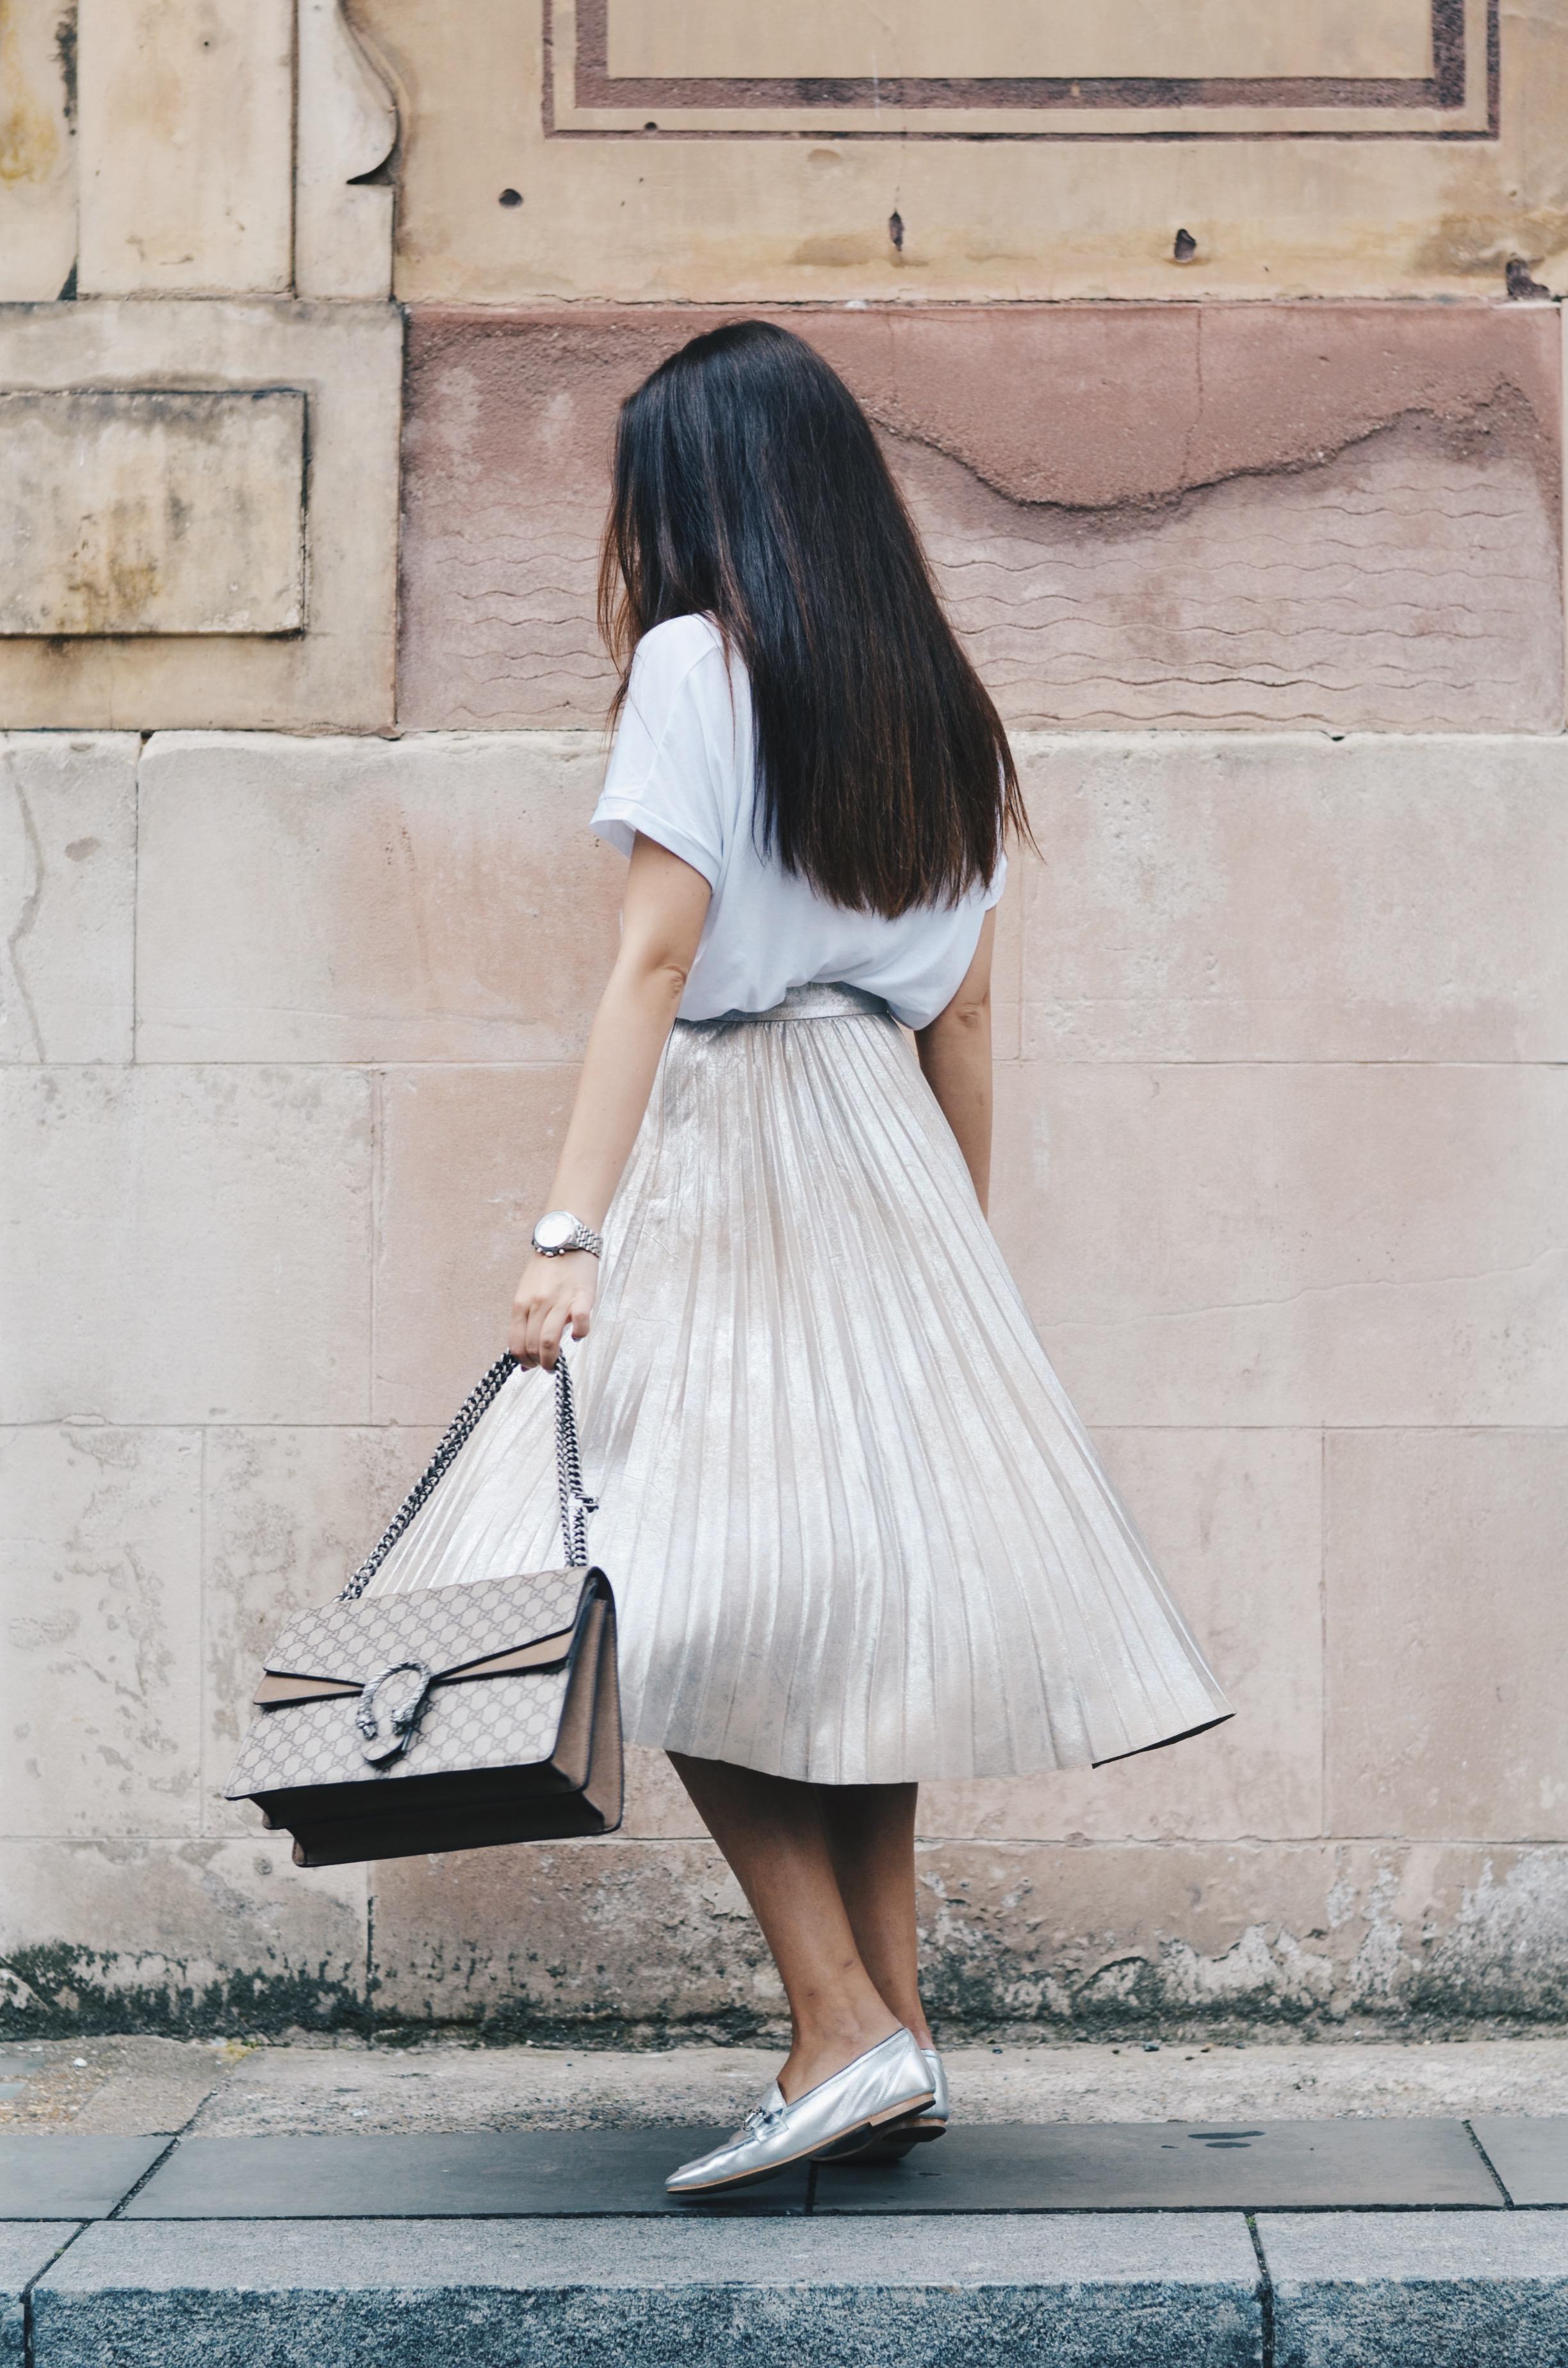 Top: ZARA | Skirt: ZARA | Shoes: Office | Bracelet: Tiffany & Co | Watch: Thomas Sabo | Bag: Gucci